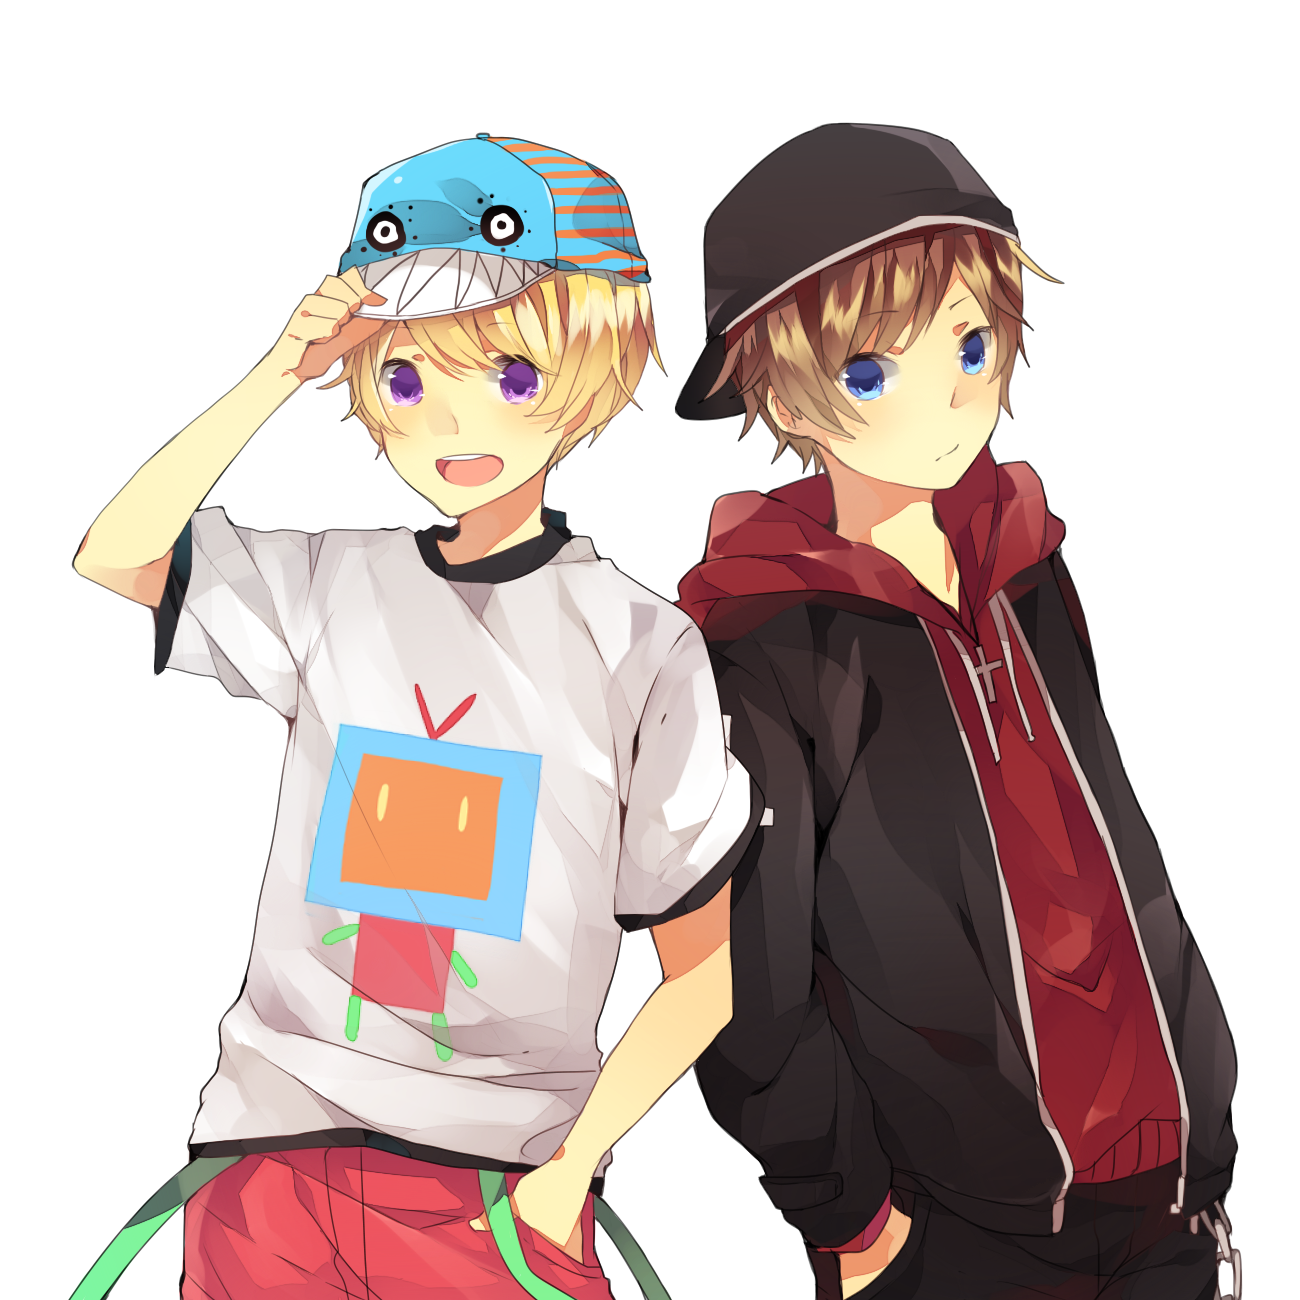 anime kinder